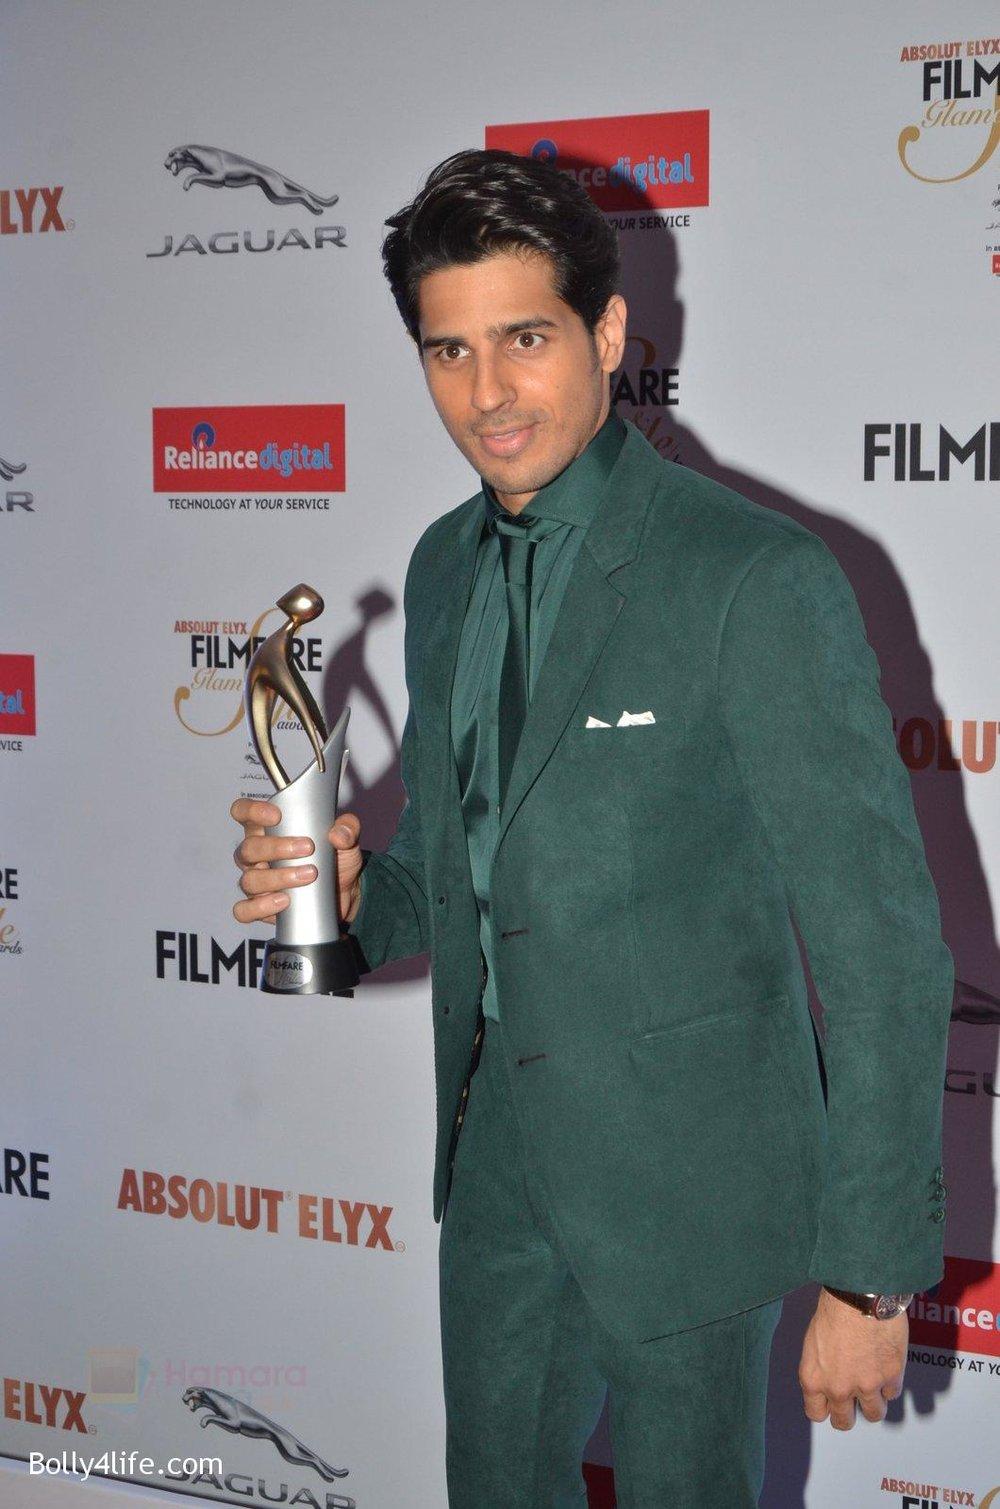 Sidharth-Malhotra-at-Filmfare-Glamour-Style-Awards-2016-in-Mumbai-on-15th-Oct-2016-2147.jpg